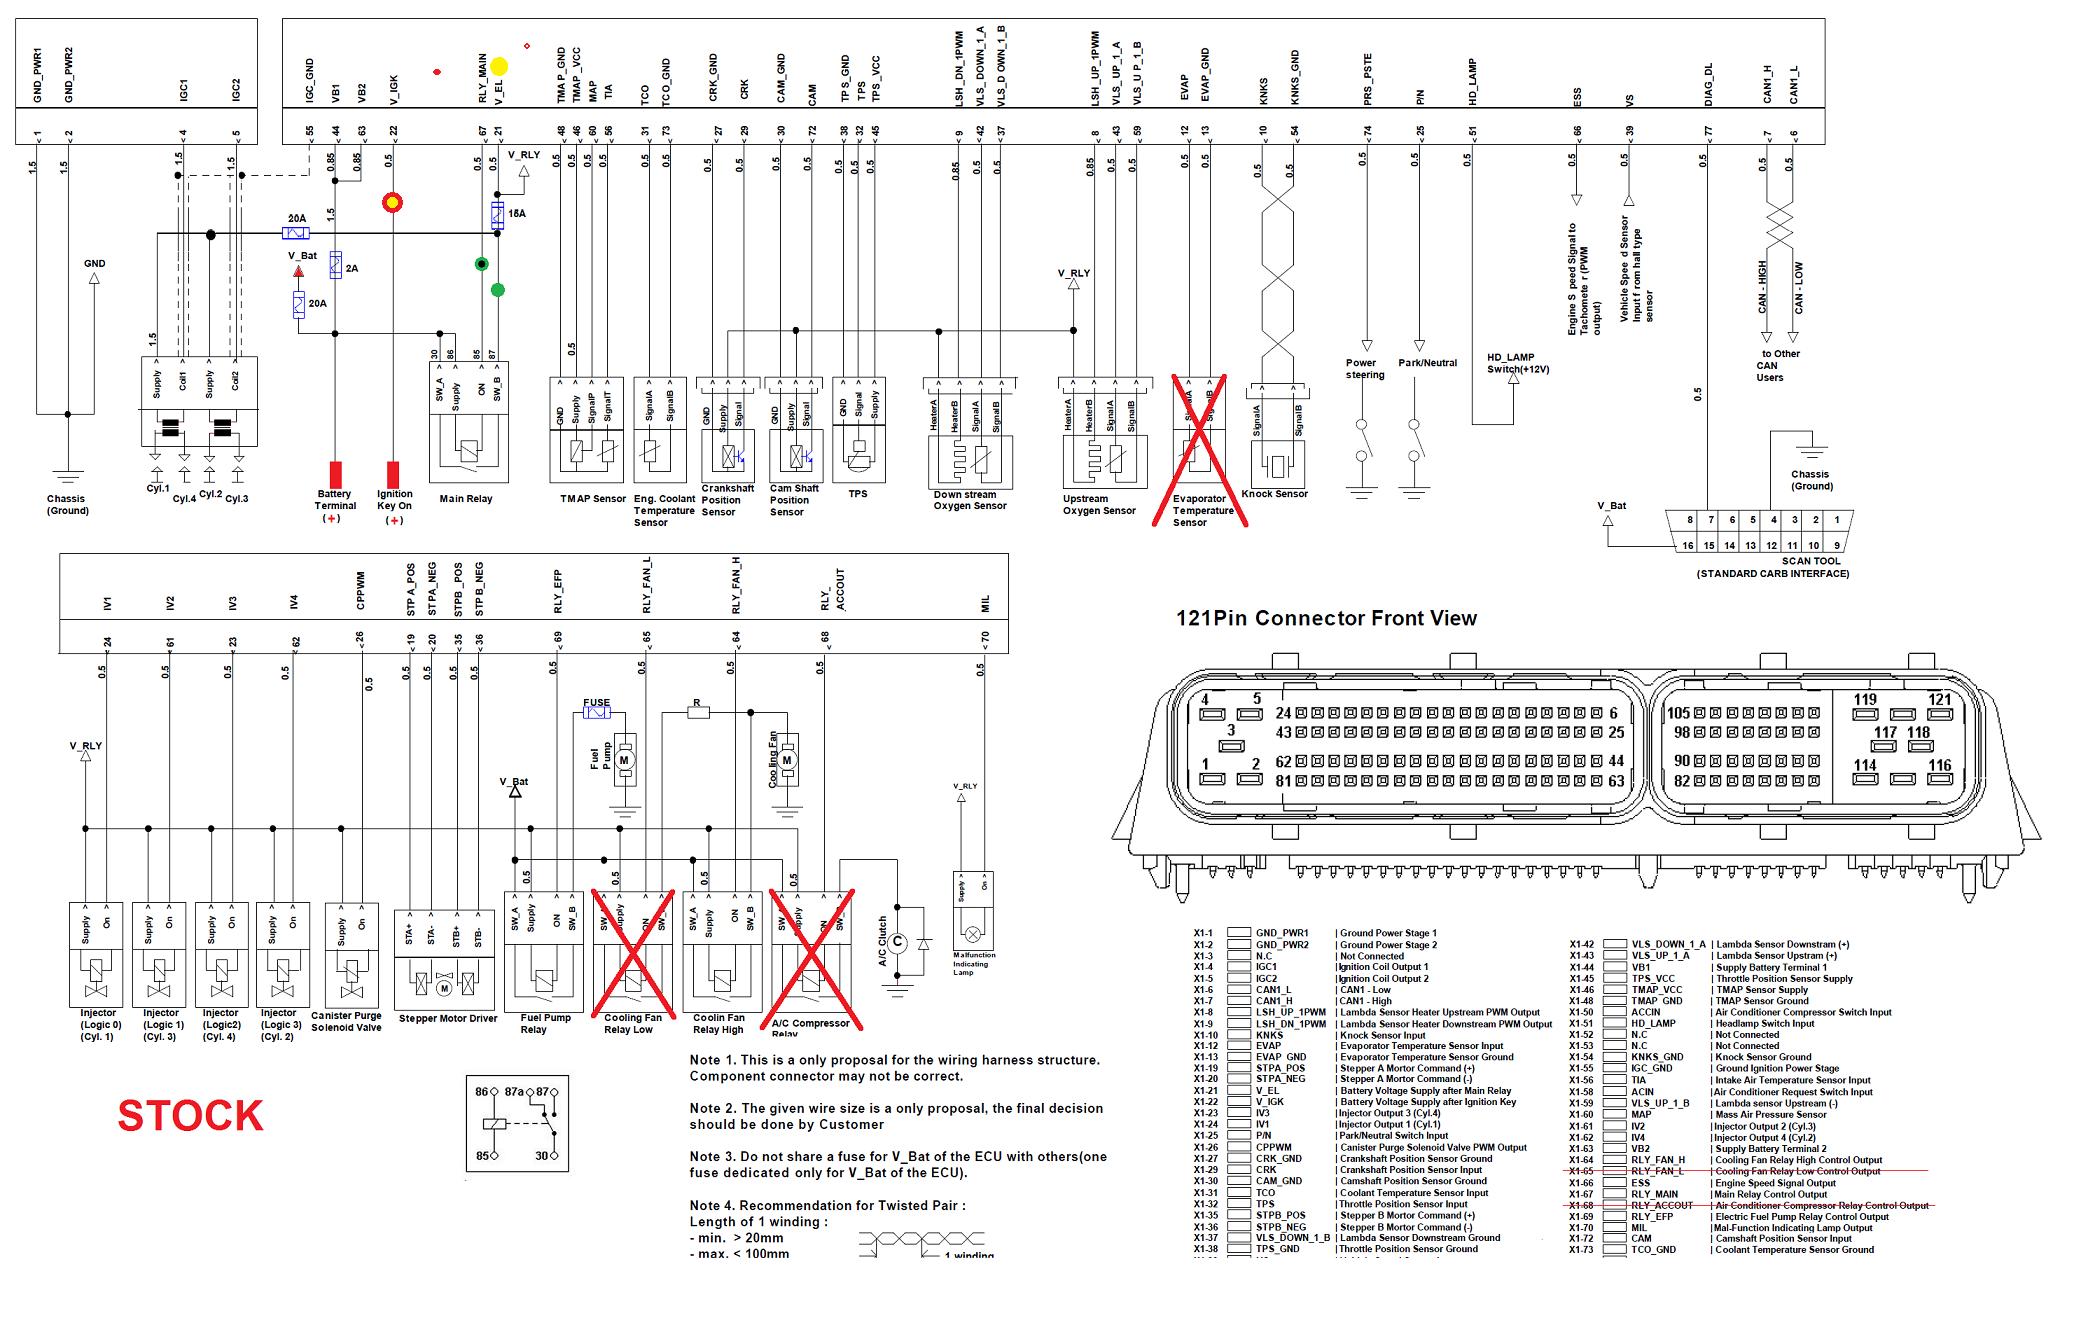 Joyner Trooper 1100cc - Joyner Utv Sxs Forum